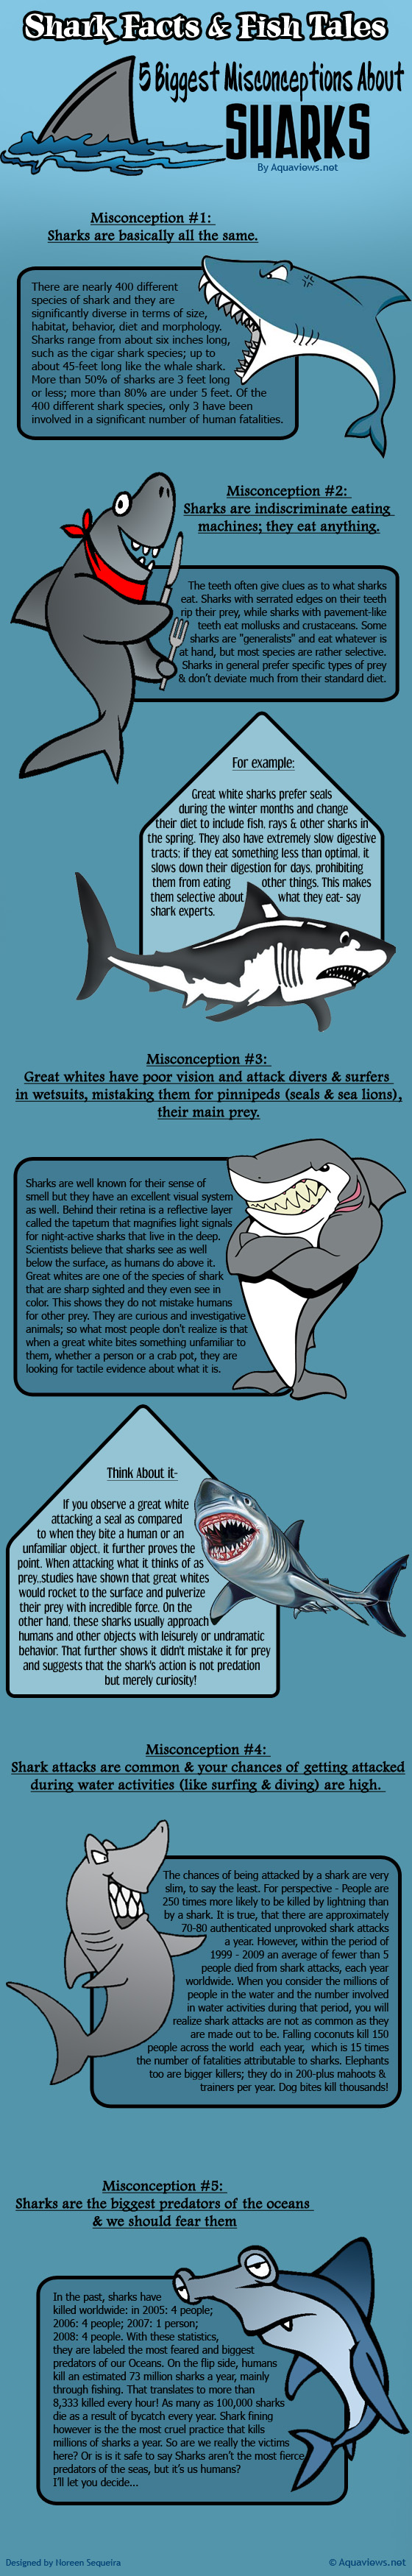 Shark-Infographic